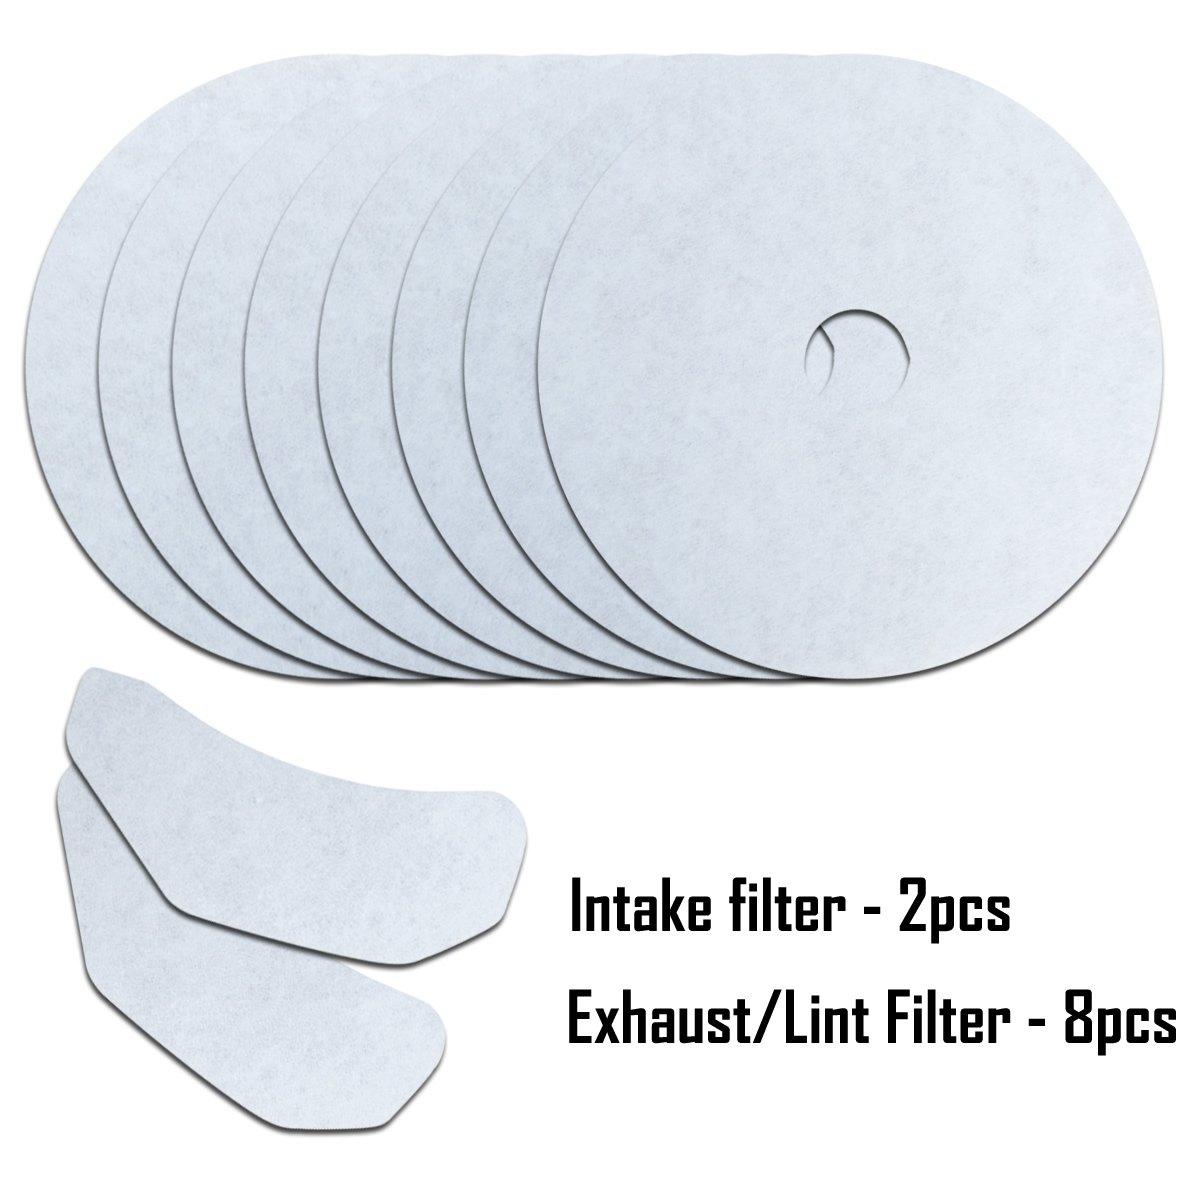 CTT 10Pack Universal Cloth Dryer Exhaust Filter Set Replacement for Panda/Magic Chef/Sonya/Avant